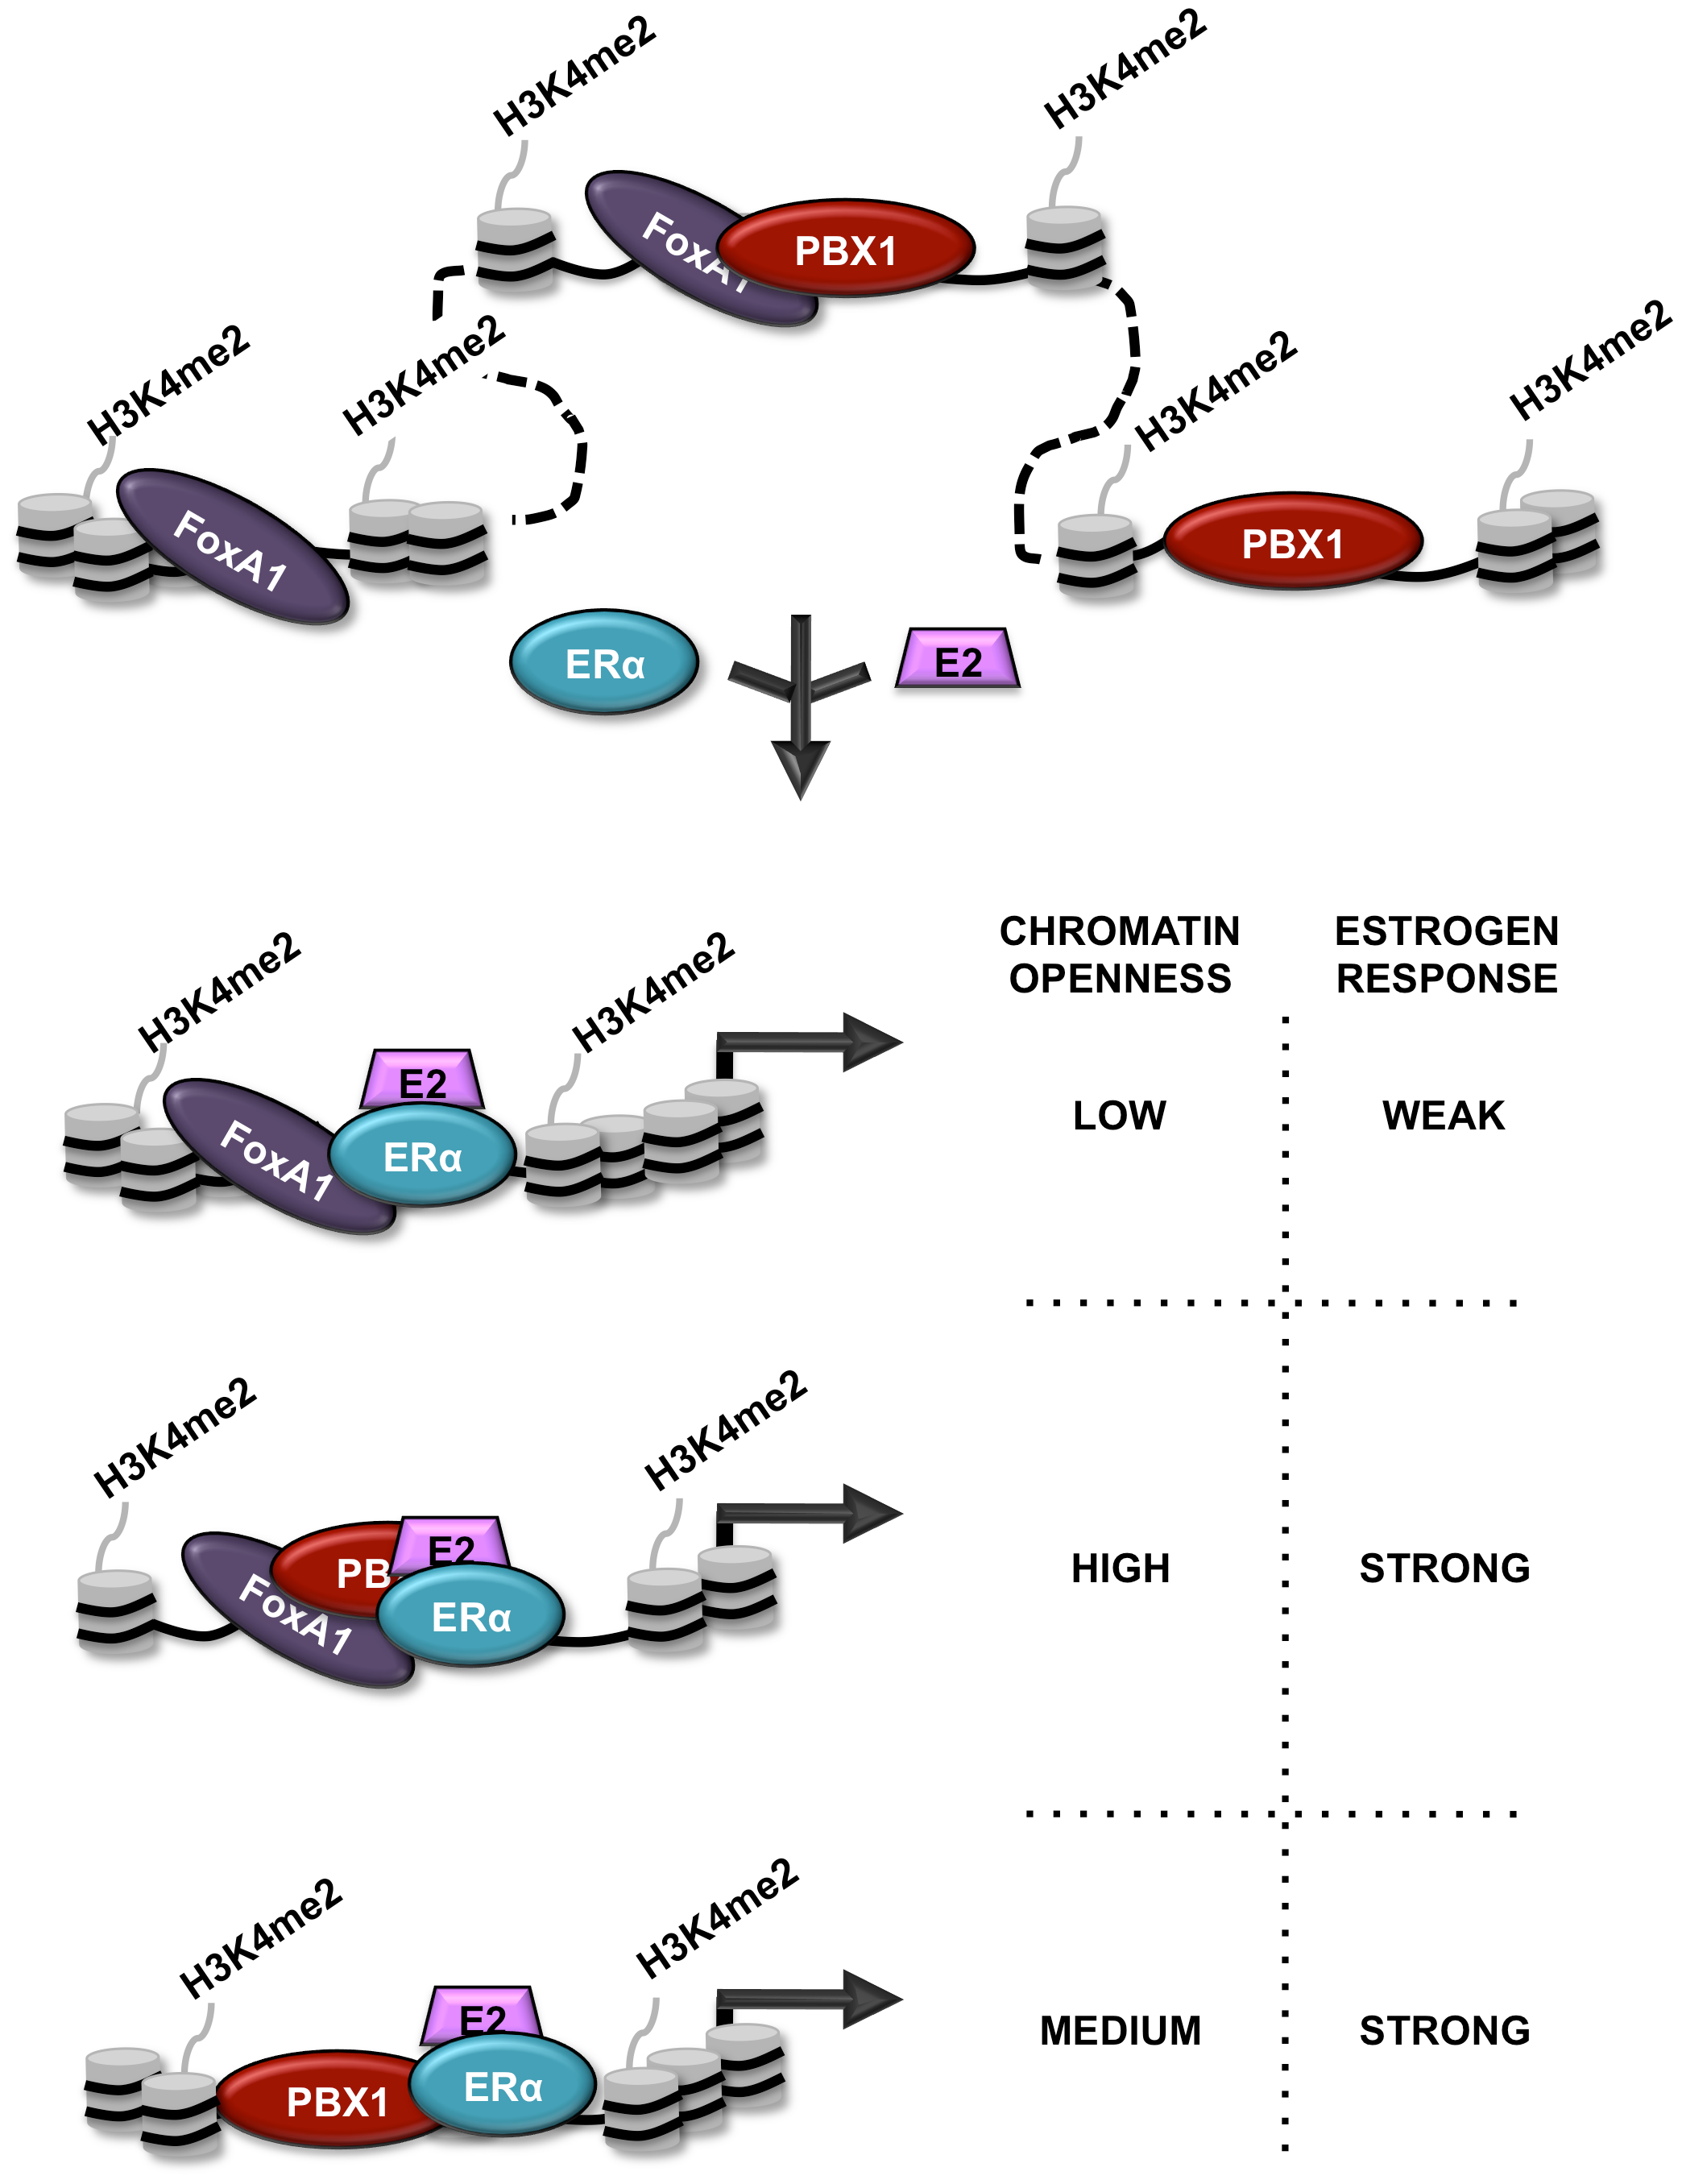 Schematic representation of PBX1 activity in breast cancer.